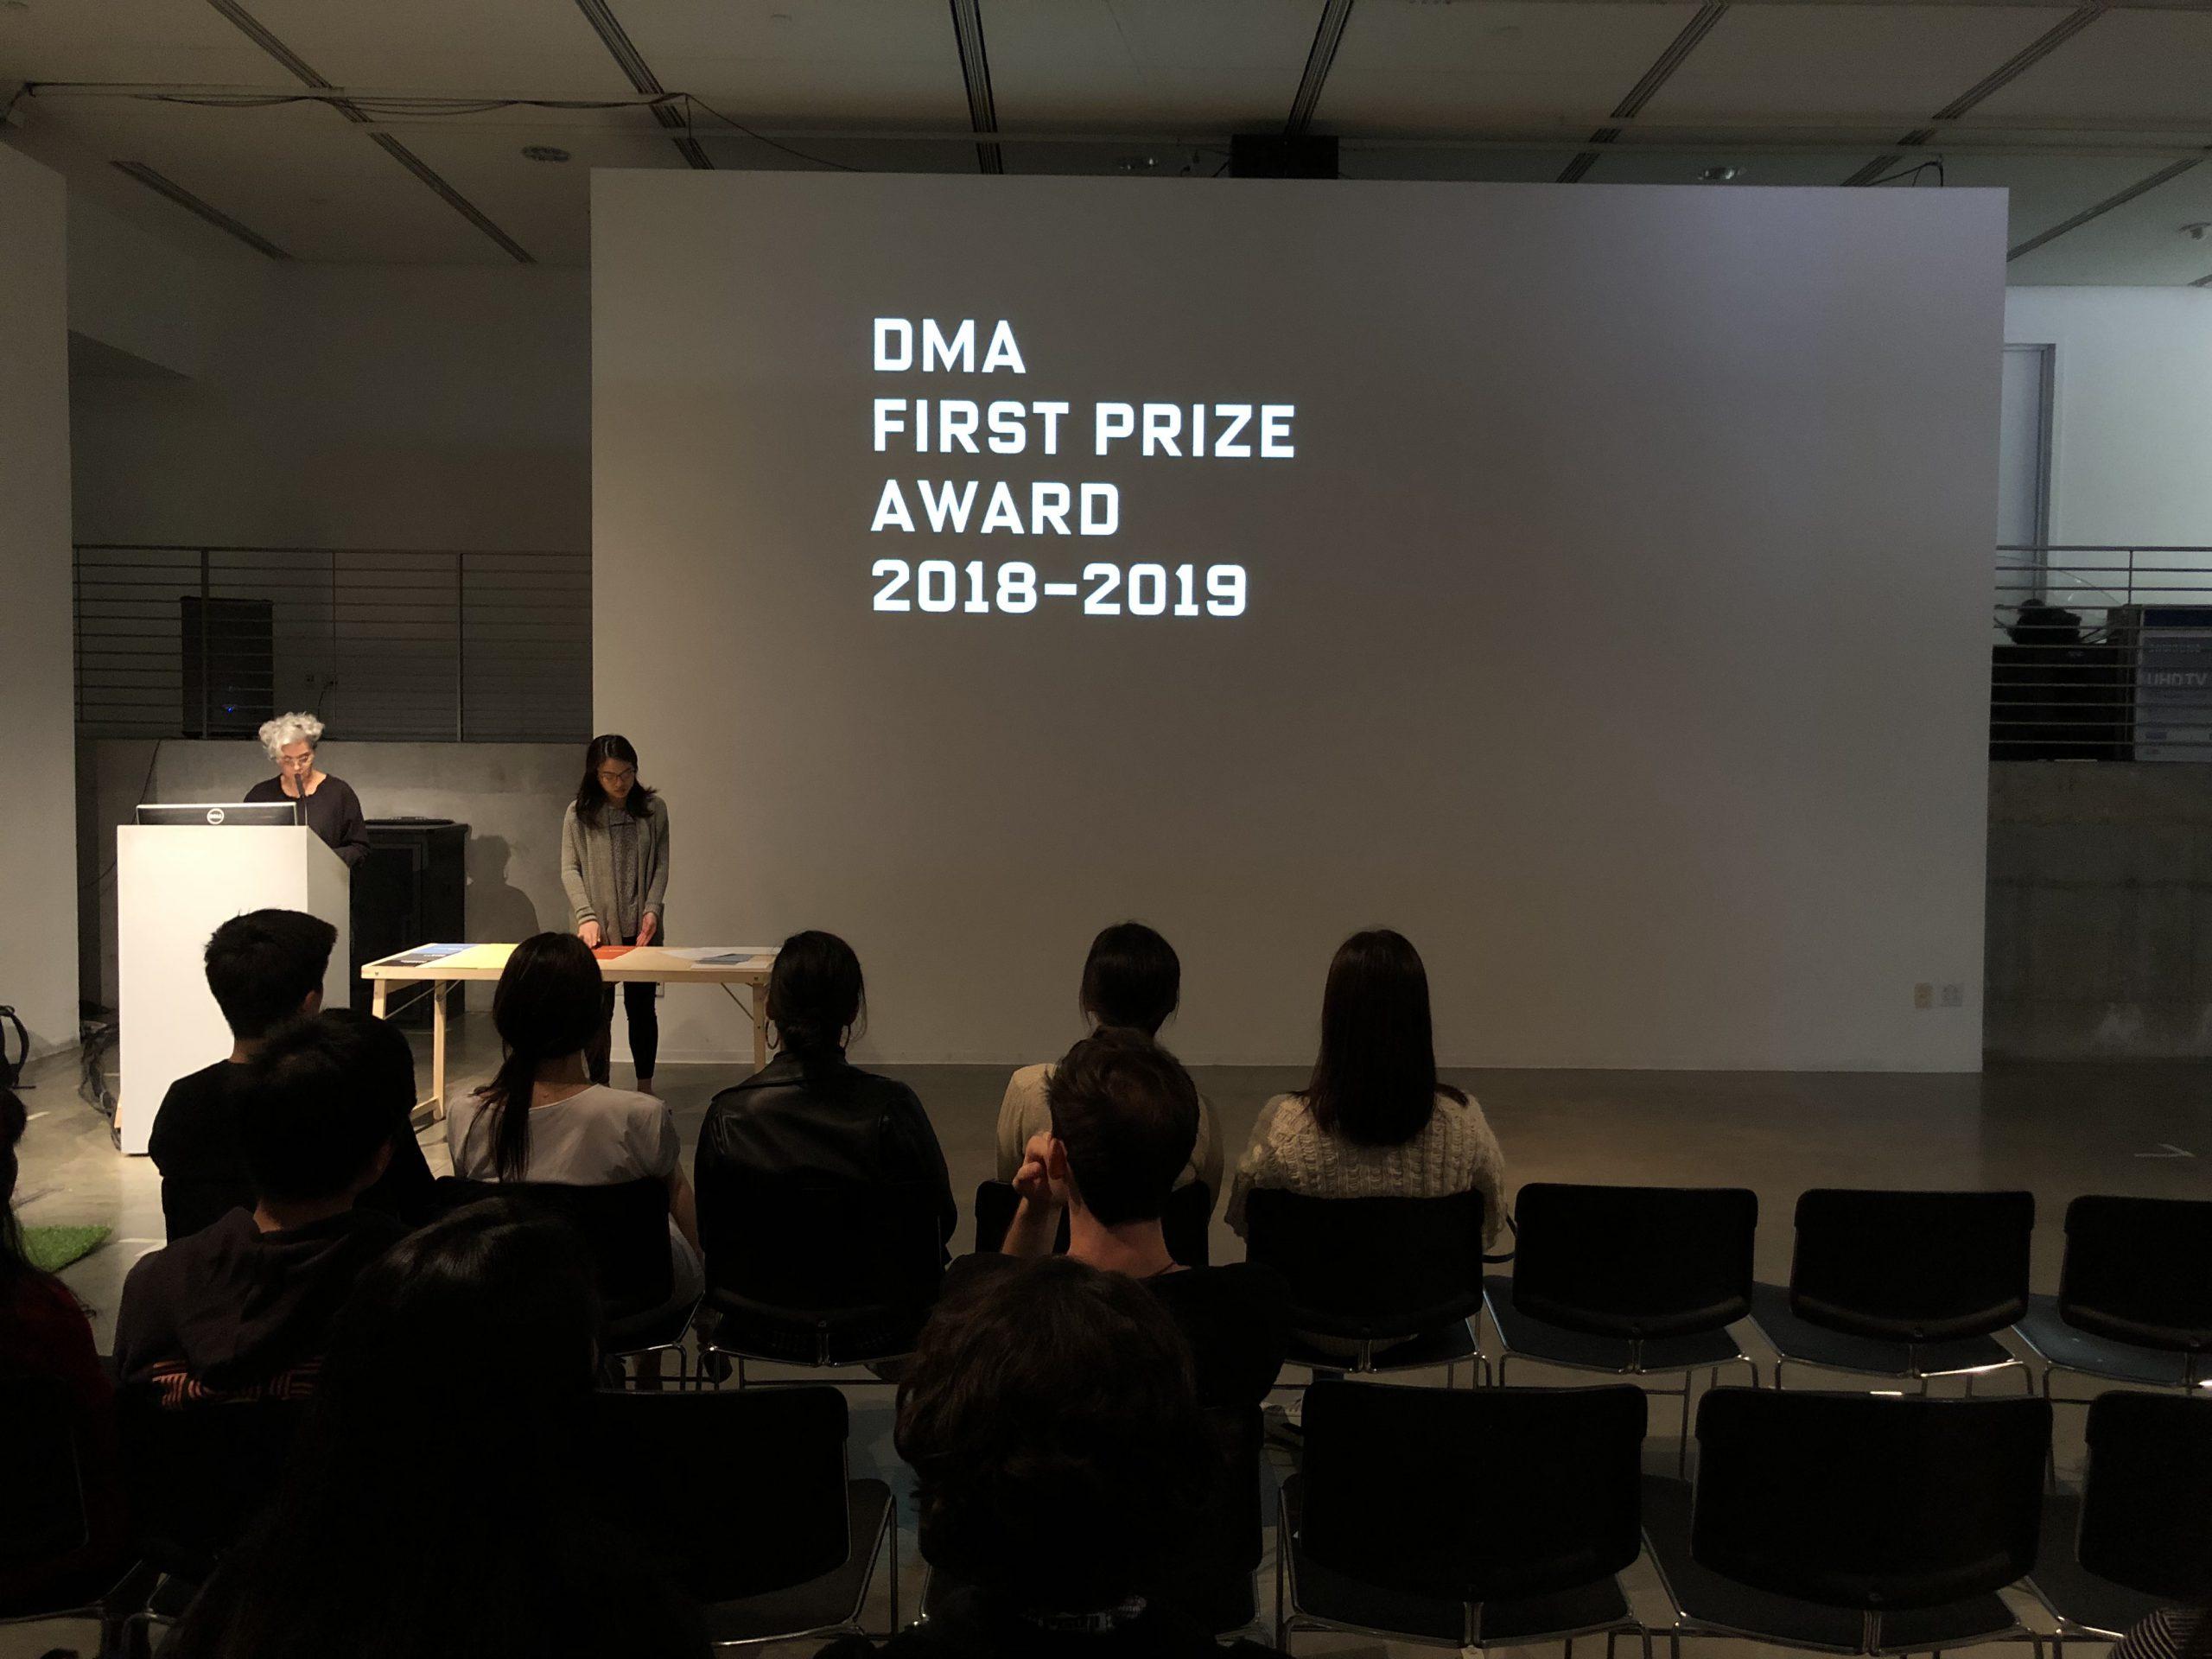 DMA Scholarship Reception 2019-2020, DMA First Prize Award 2018-2019